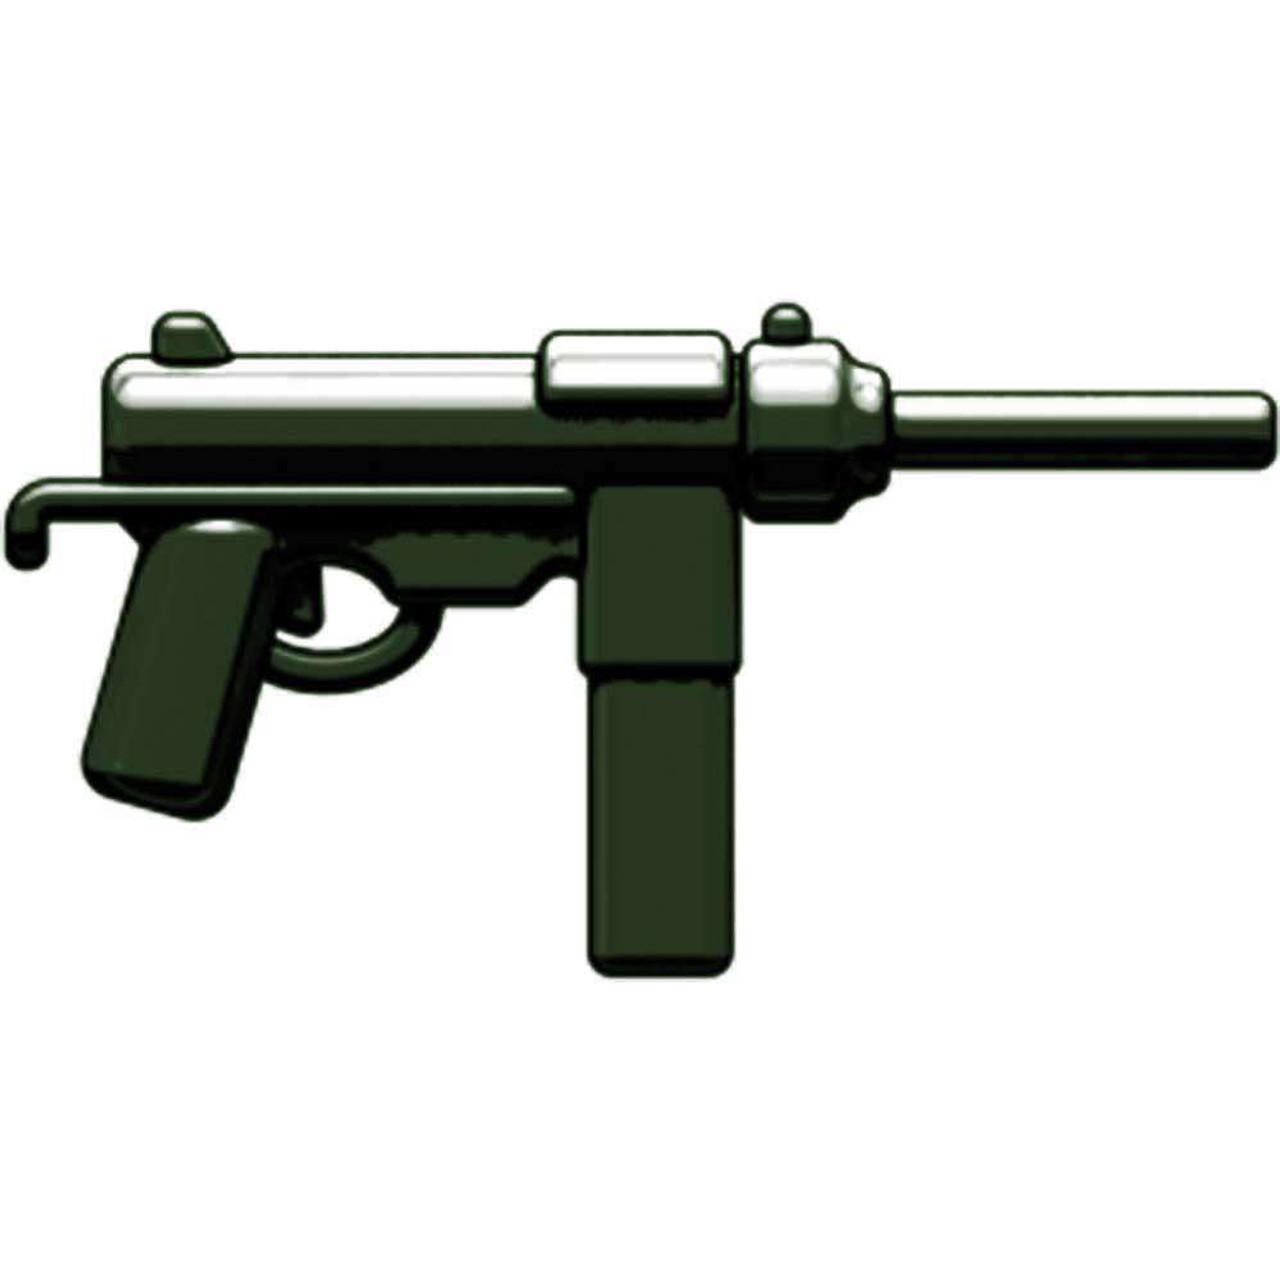 BrickArms Weapons M3 Grease Gun 2.5-Inch [Dark Olive Green]